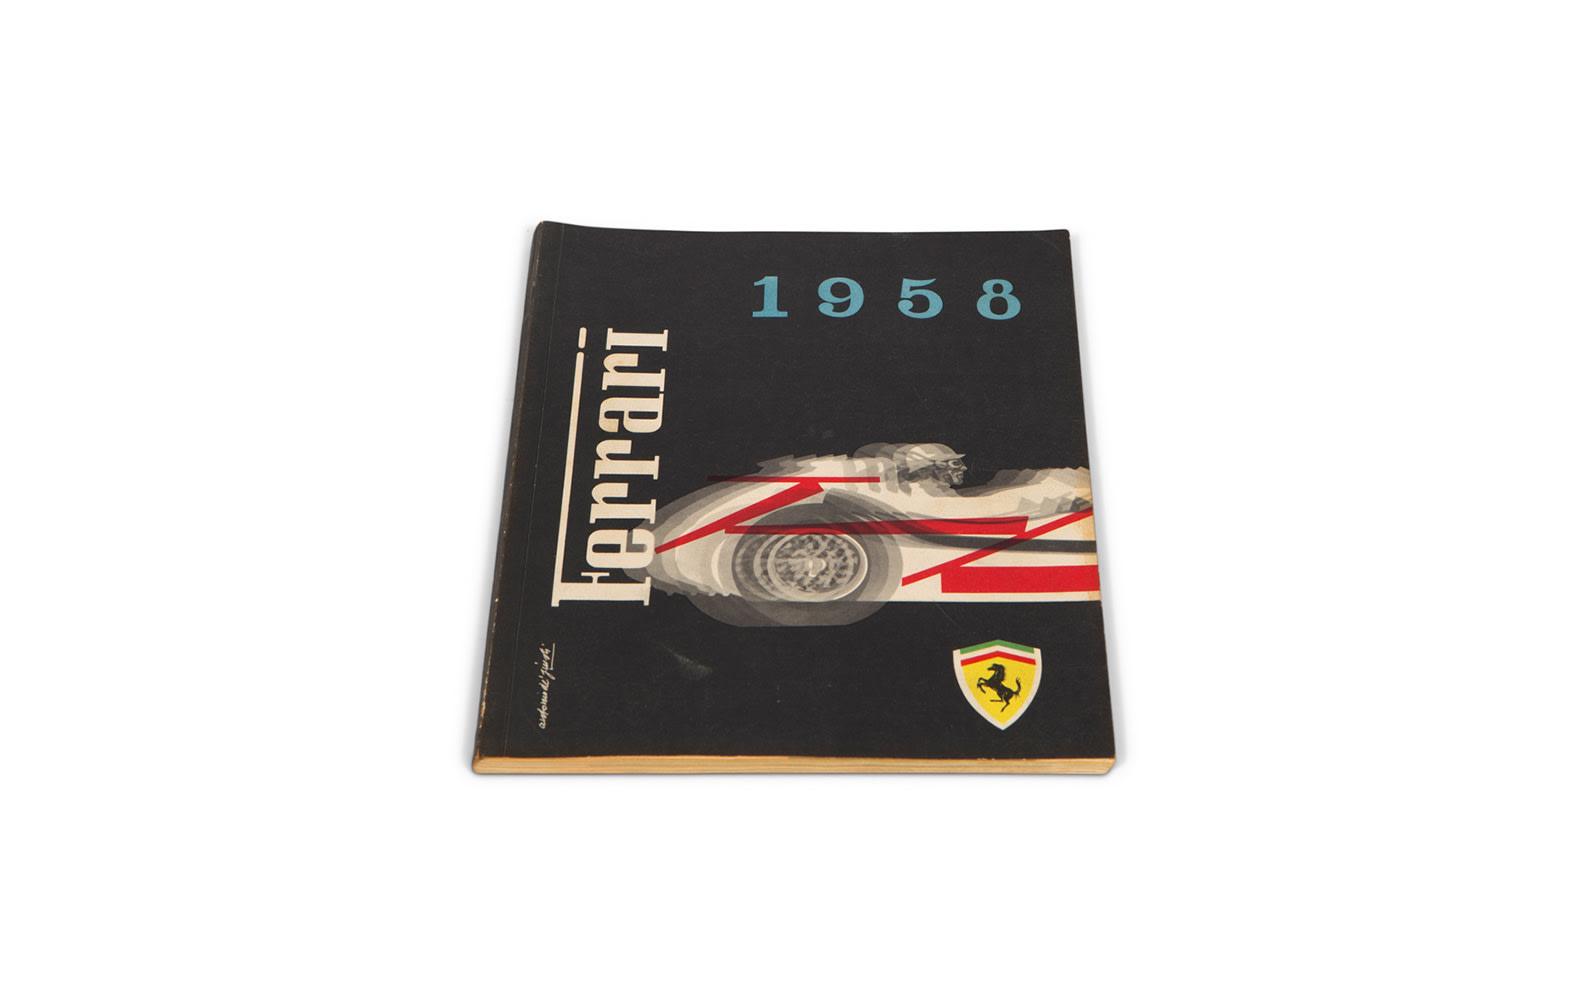 Ferrari Yearbook, 1958